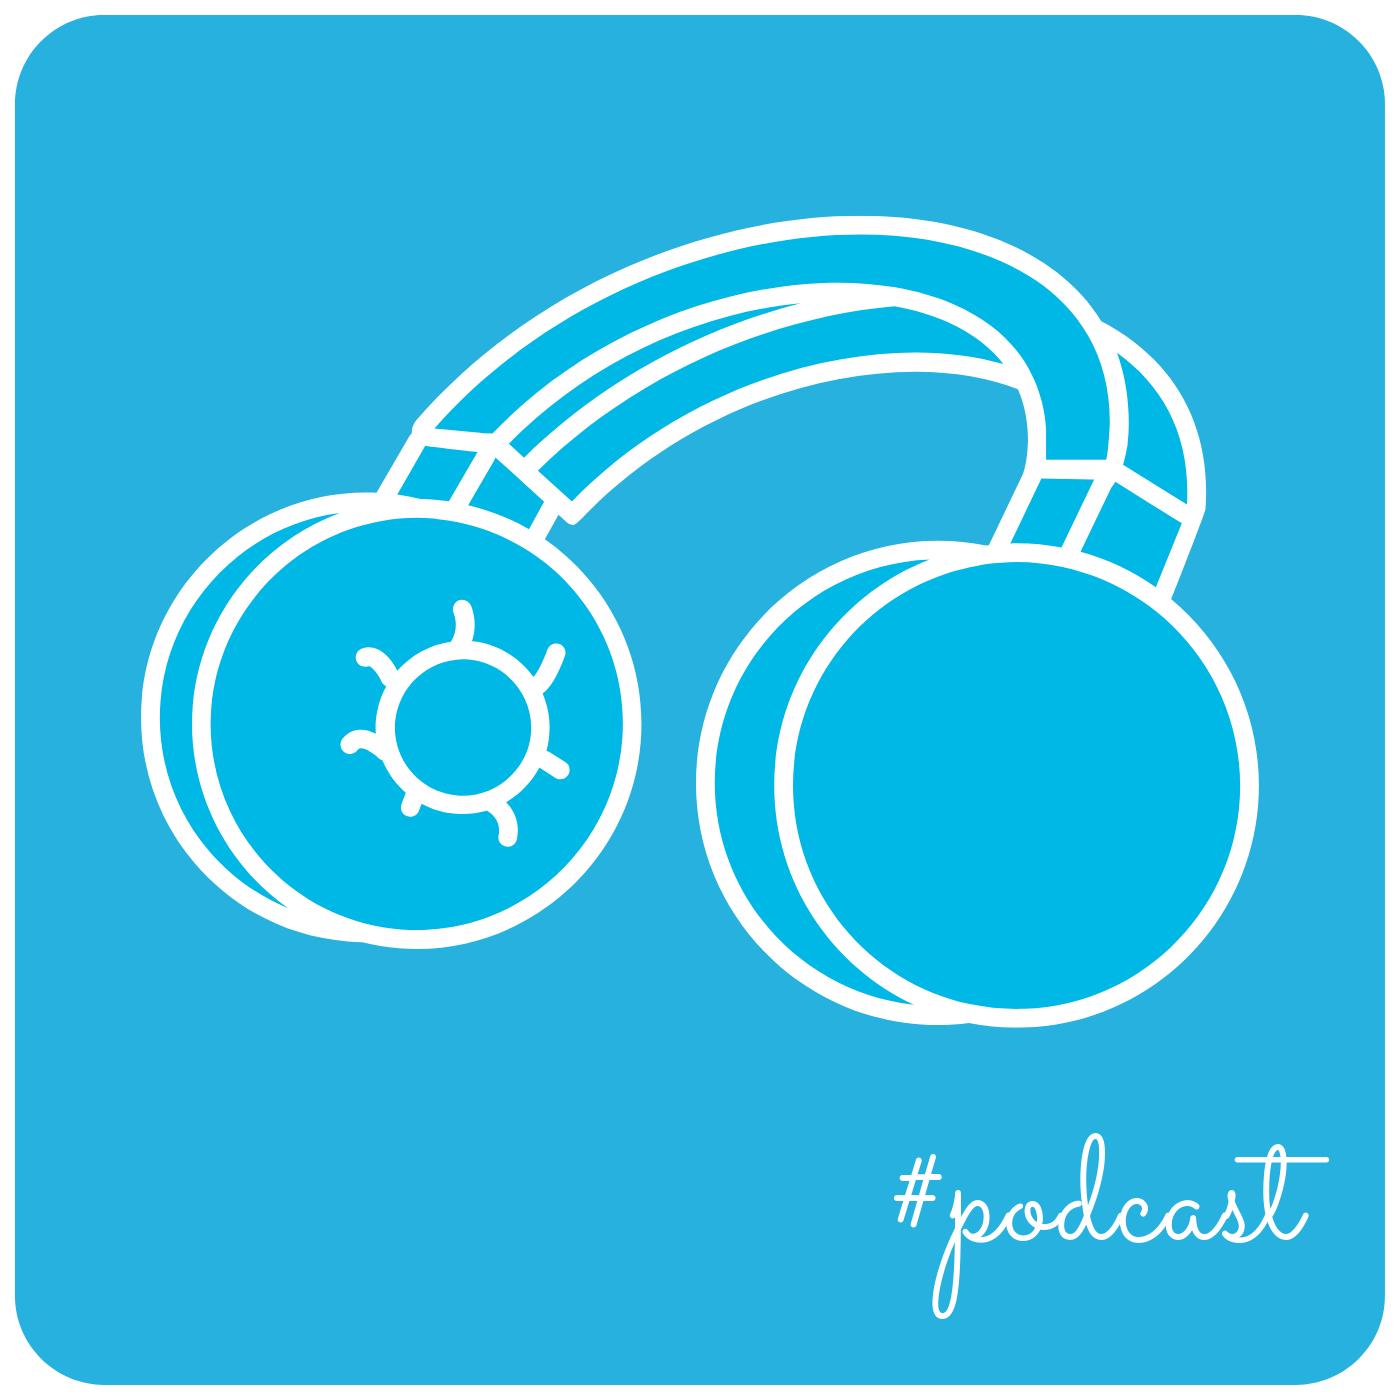 doschu podcast illustration